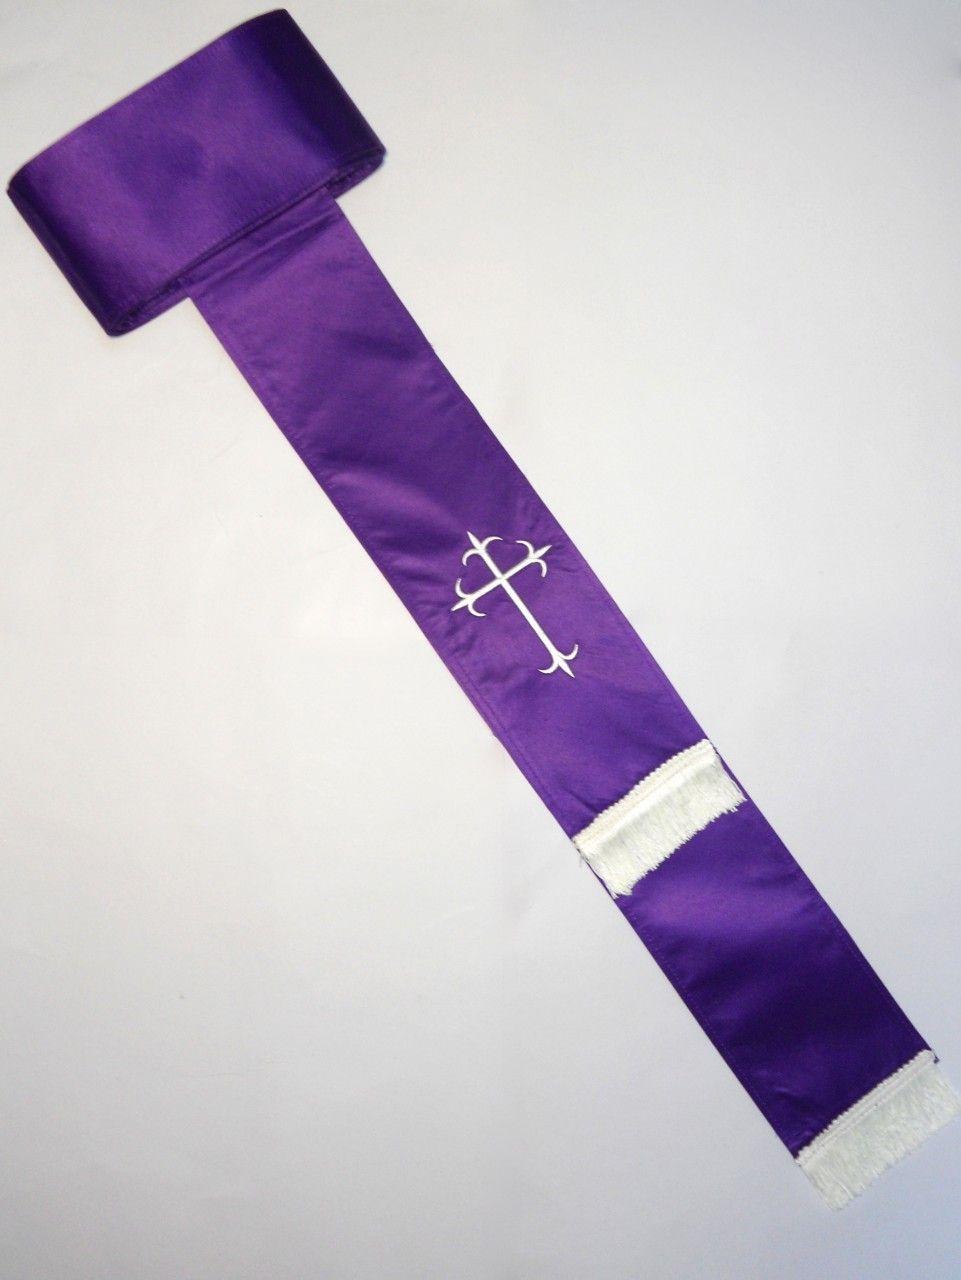 Band Cincture Belt - Purple/White Cross